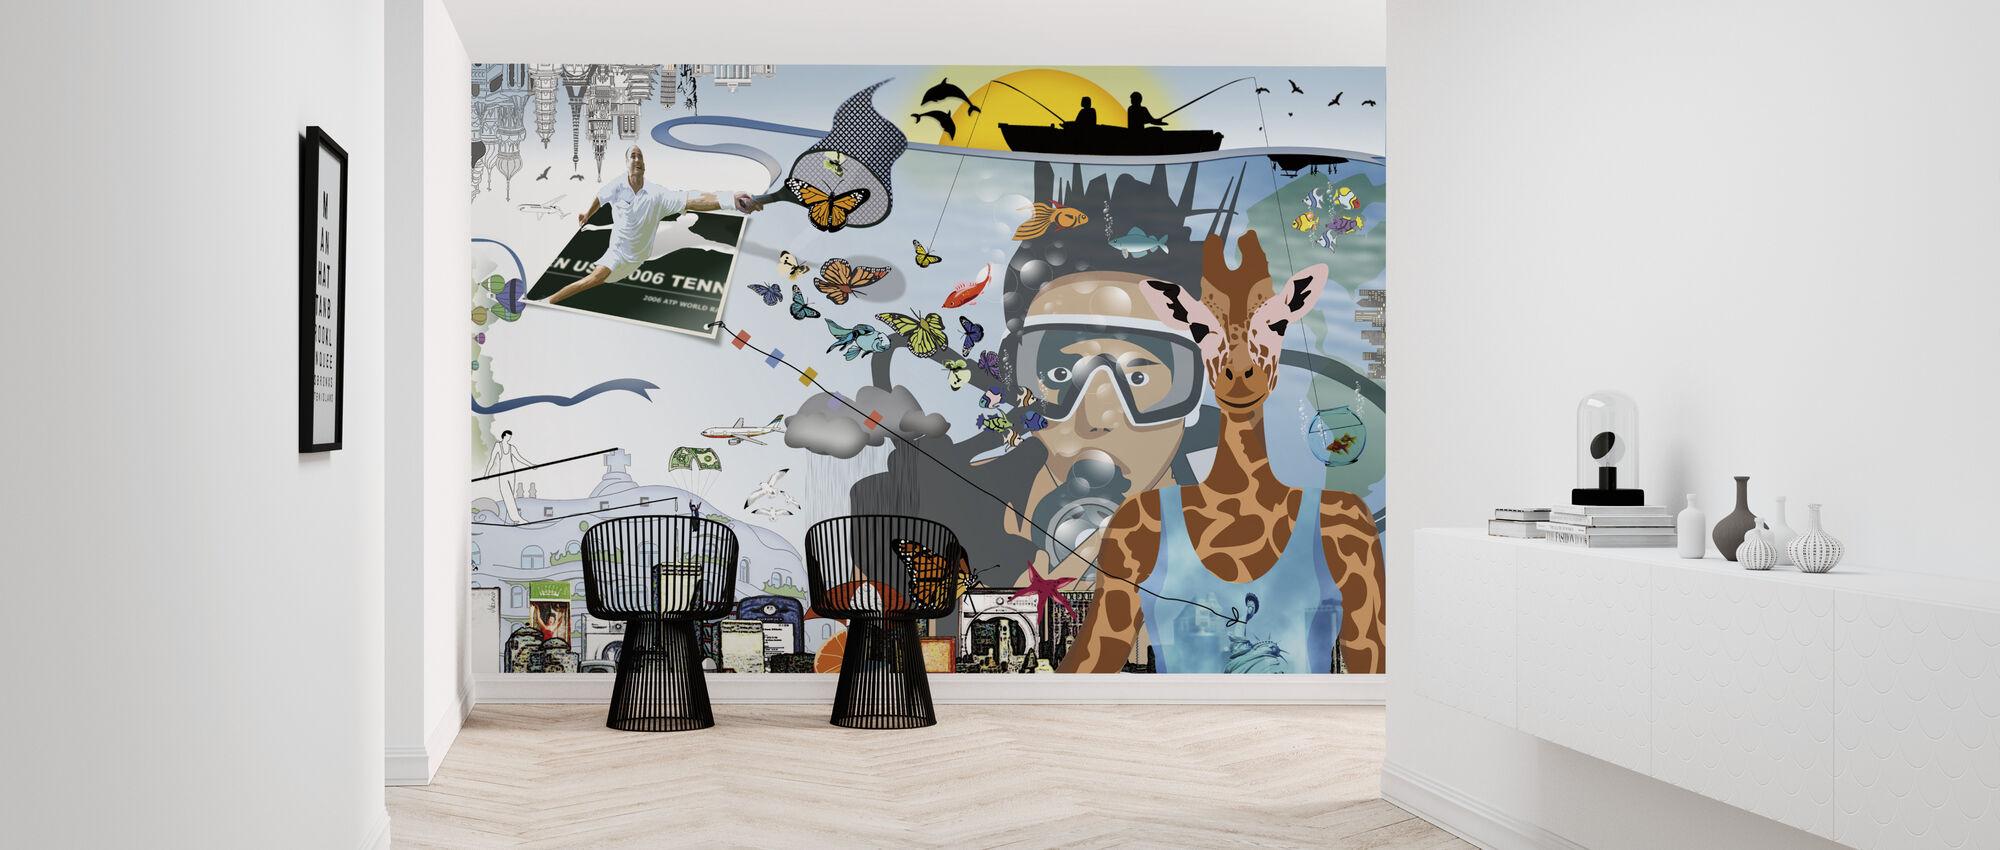 Akinolaude - Wallpaper - Hallway